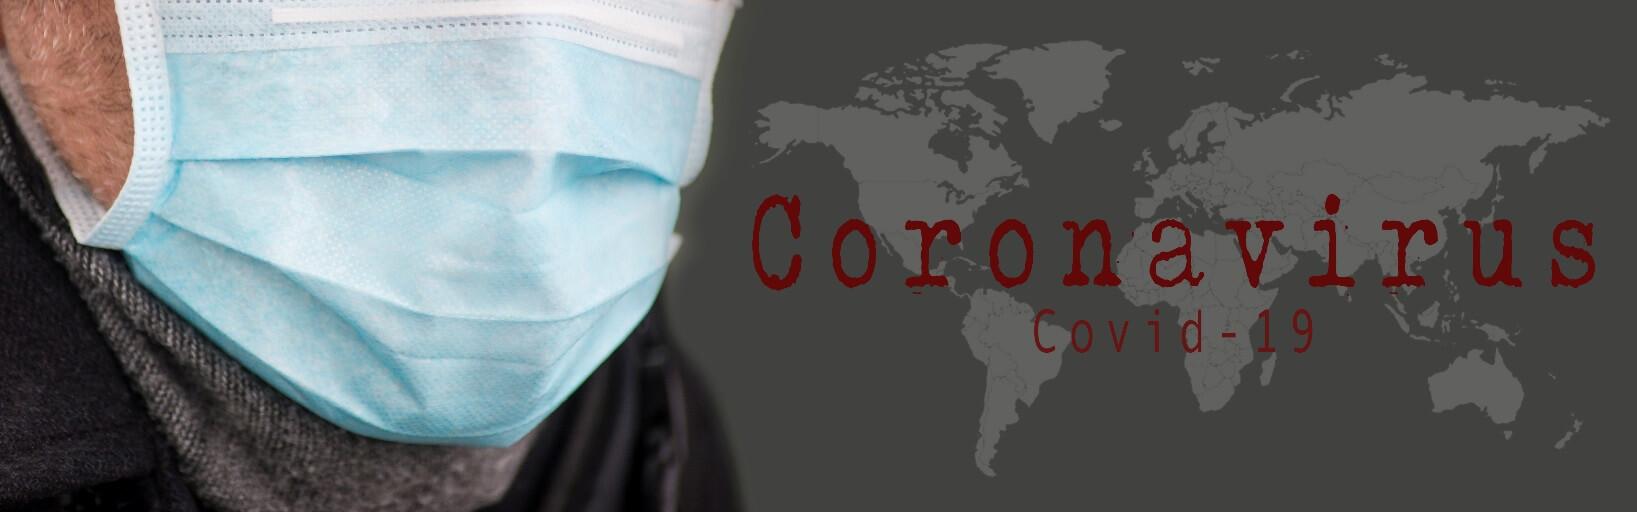 Lenco Diagnostic Laboratories to Launch Coronavirus Disease 2019 (COVID-19) Test